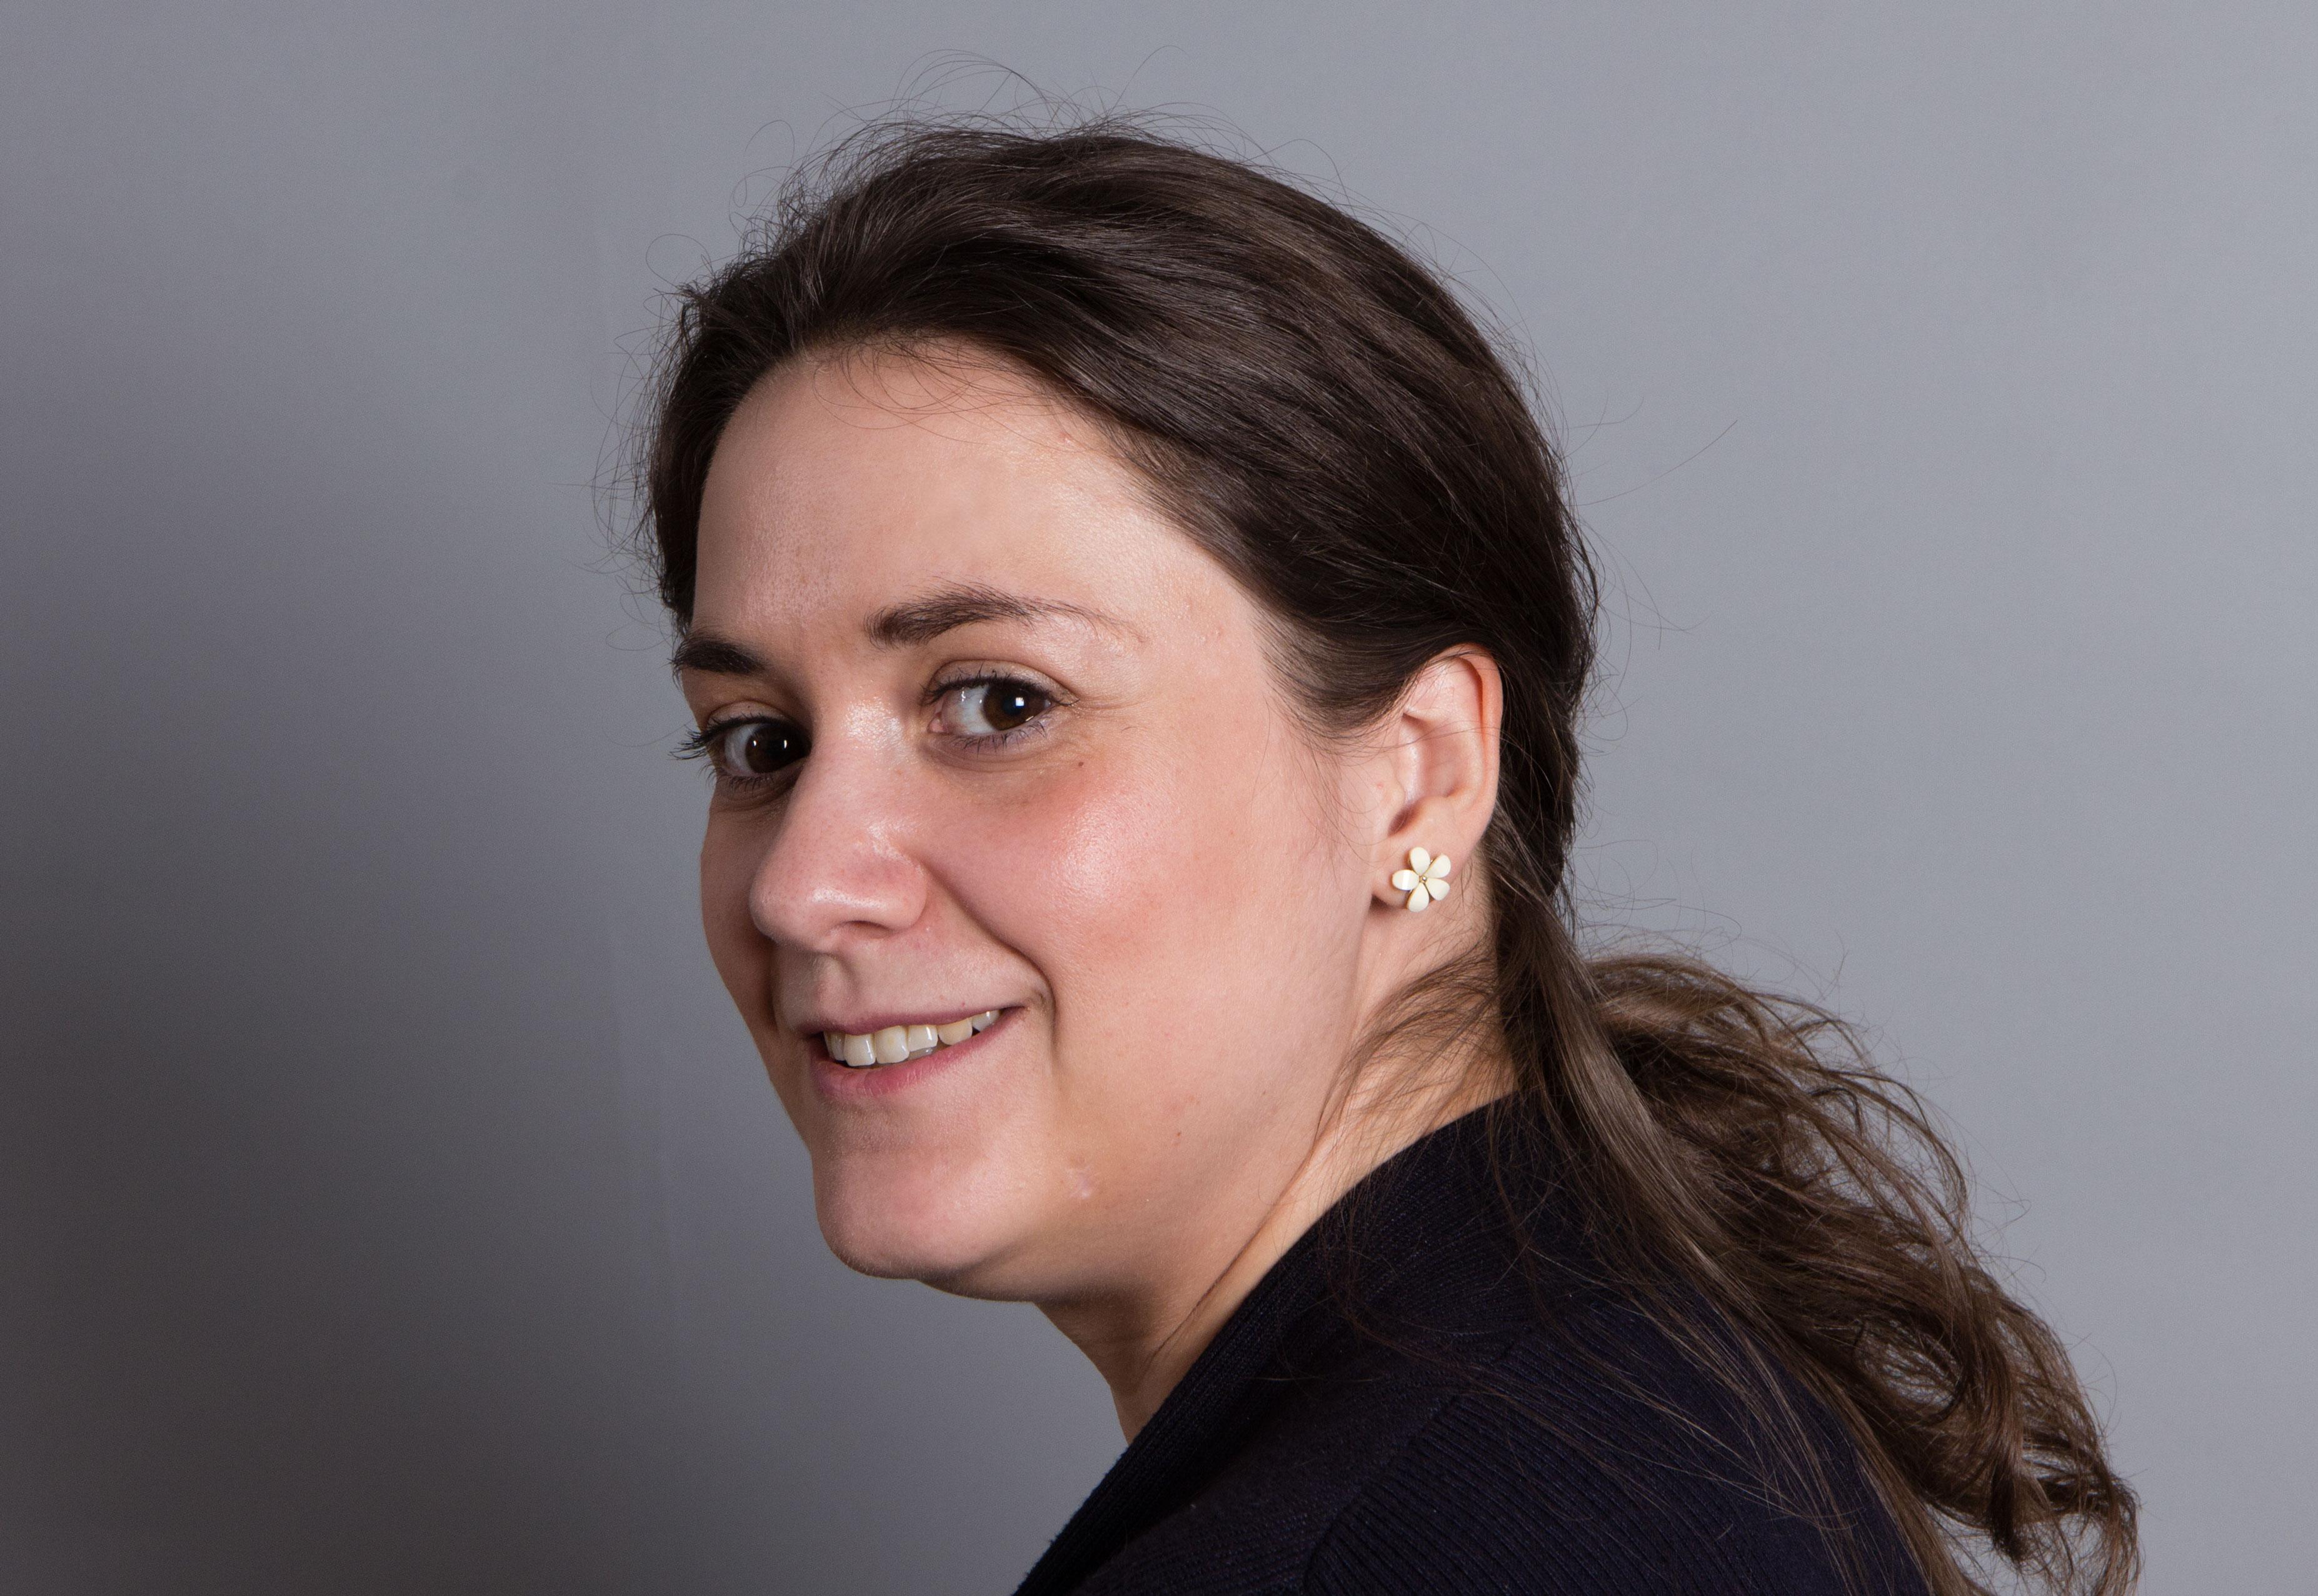 Sarah Ryglewski Wikipedia